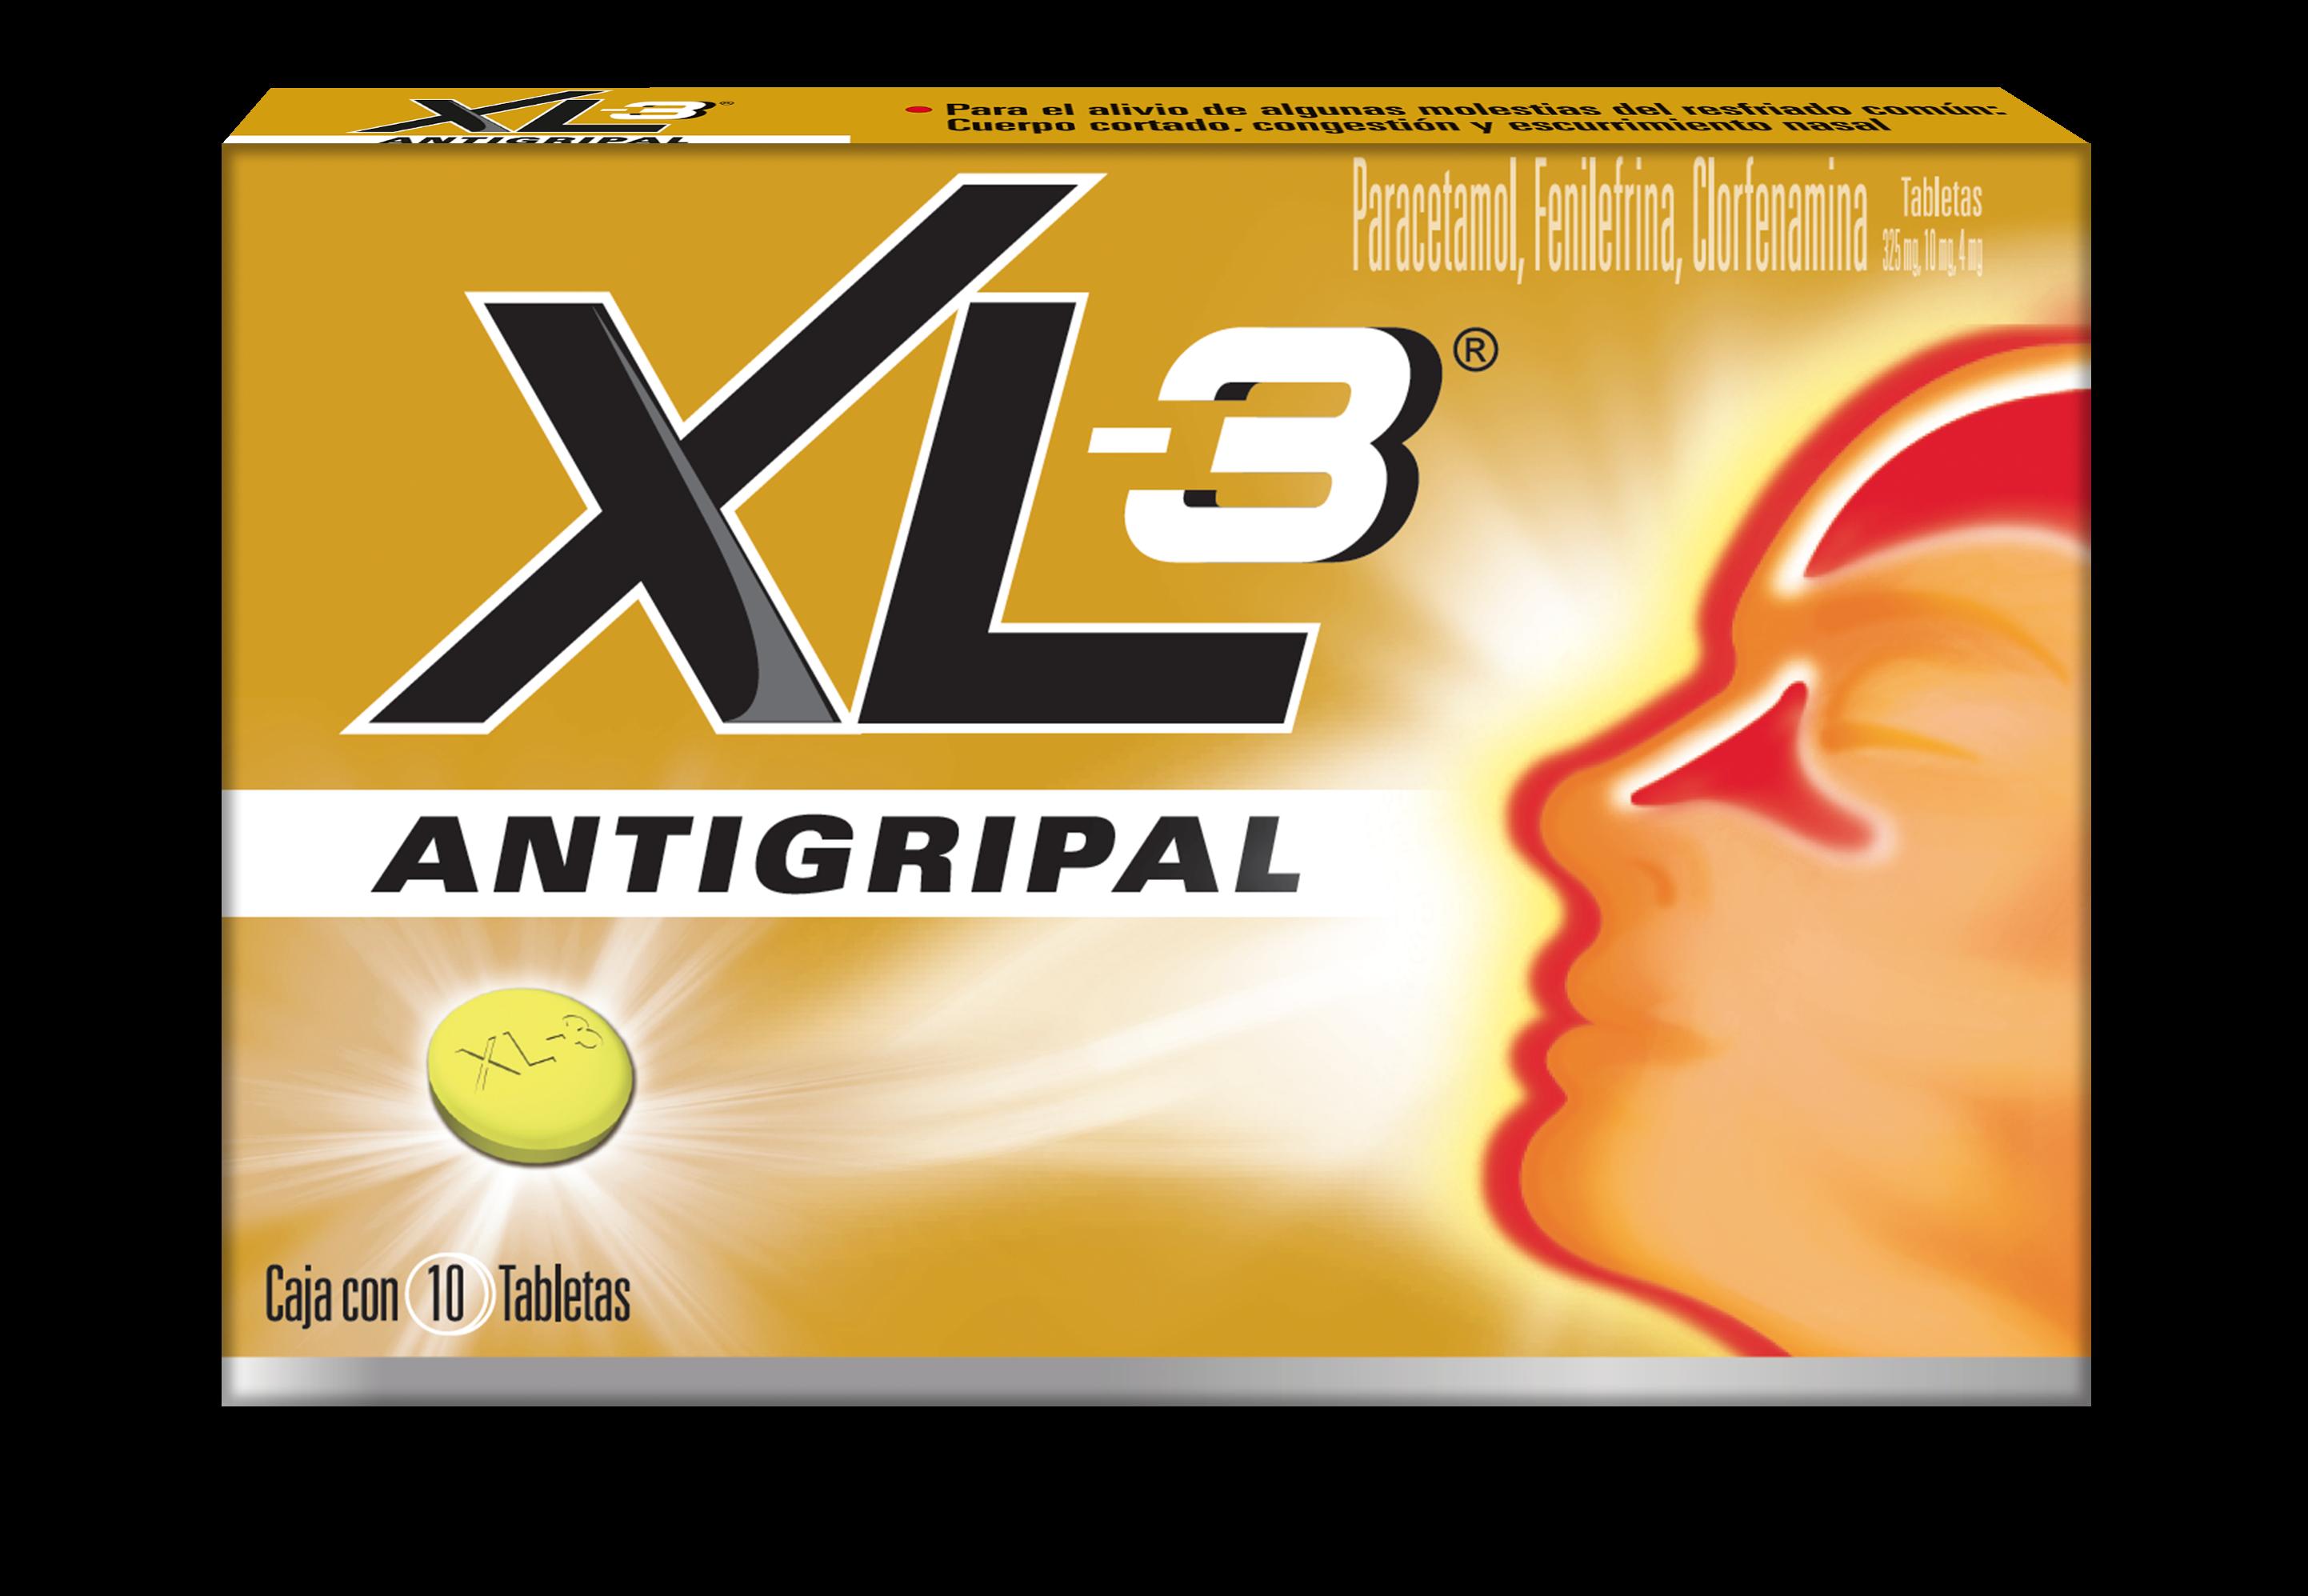 XL-3 Antigripal 10 Tabletas